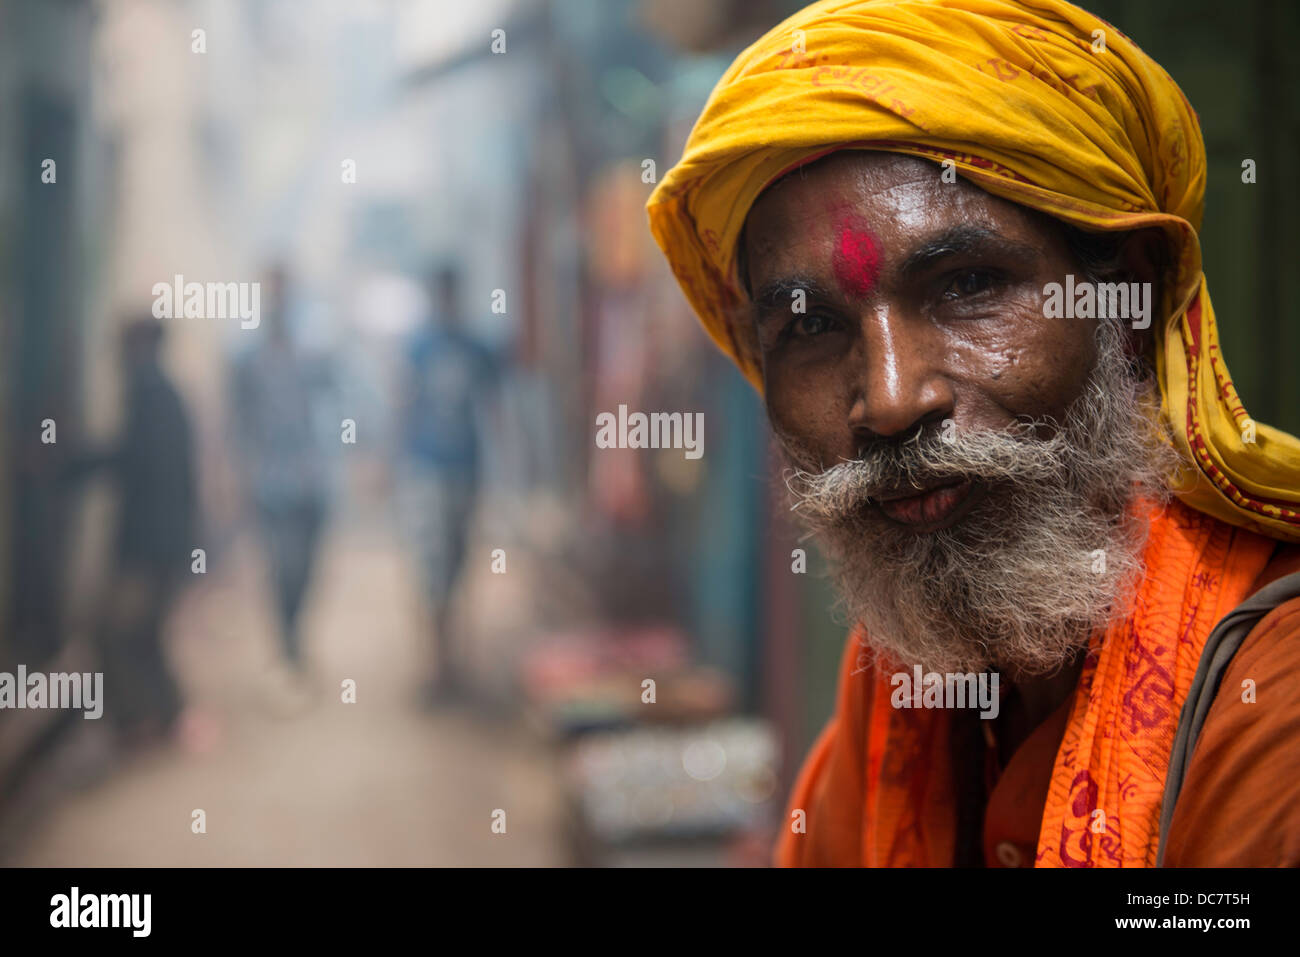 Sadhu, Holy Man off Kachaudi Gali, Varanasi, Uttar Pradesh, India - Stock Image